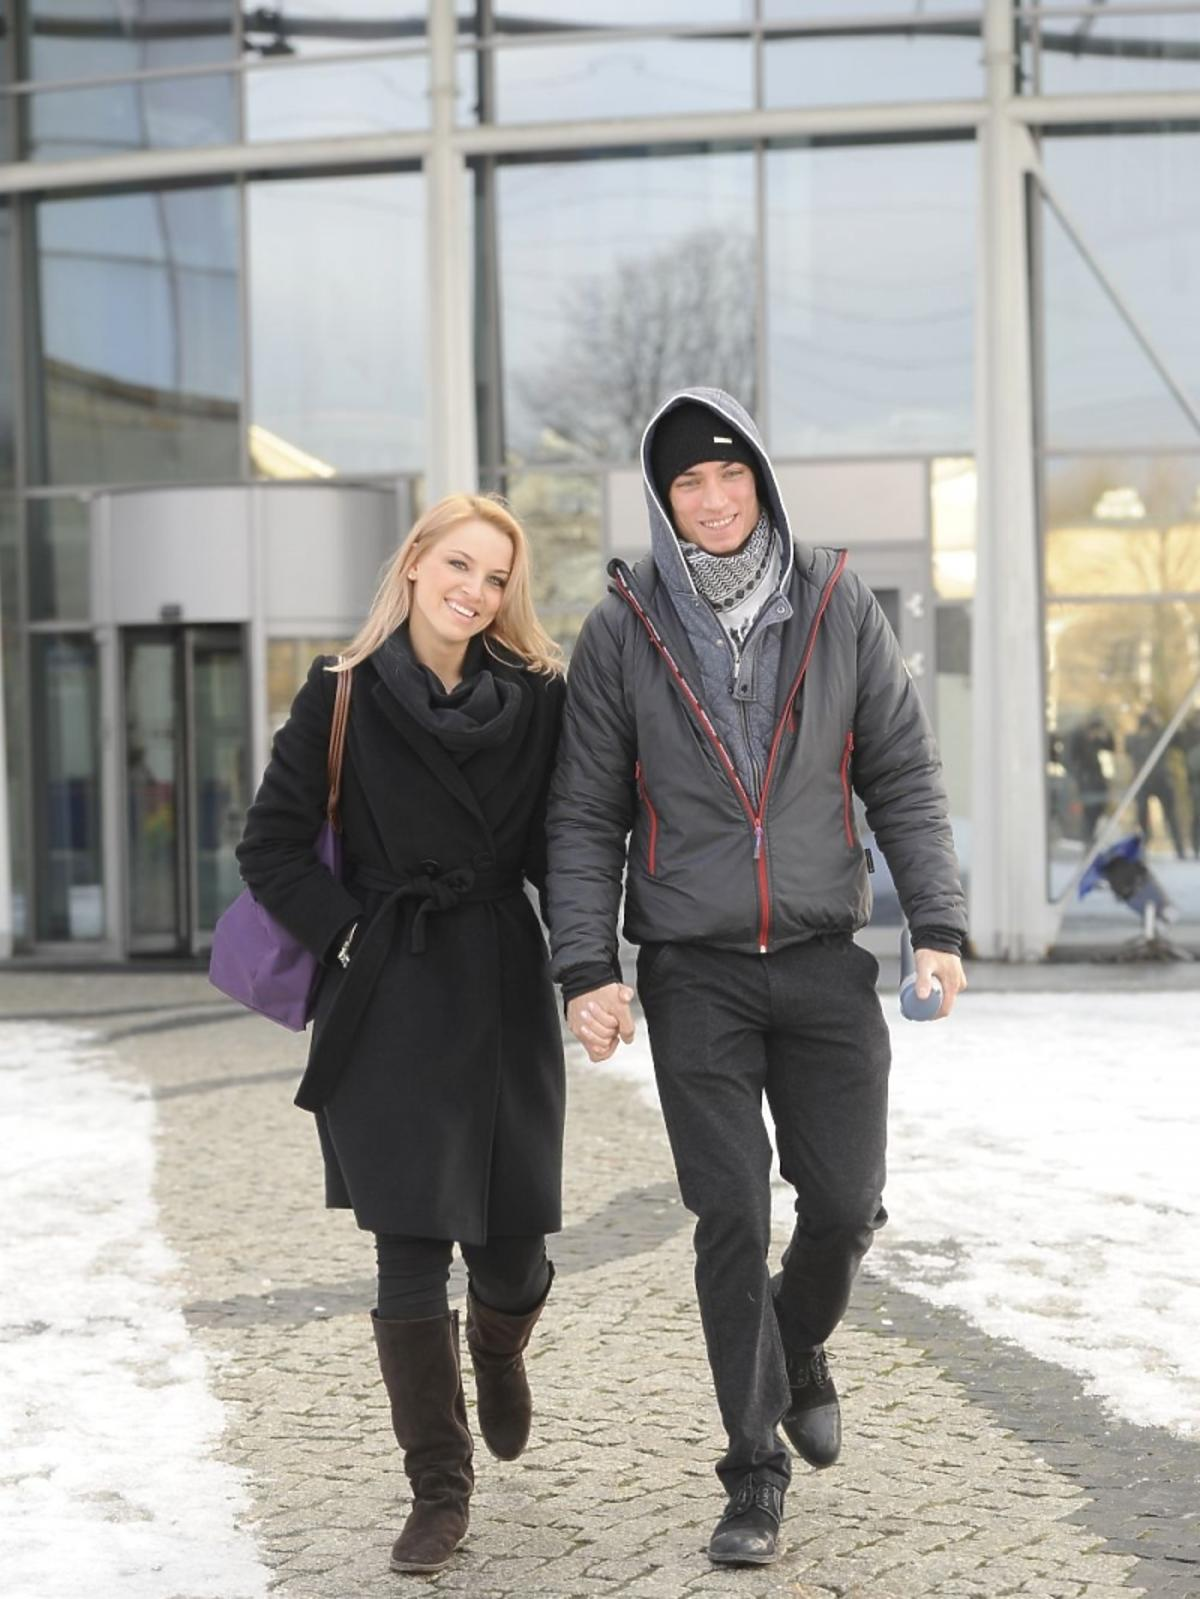 Paweł Staliński i Paulina Janicka pod studiem TVP